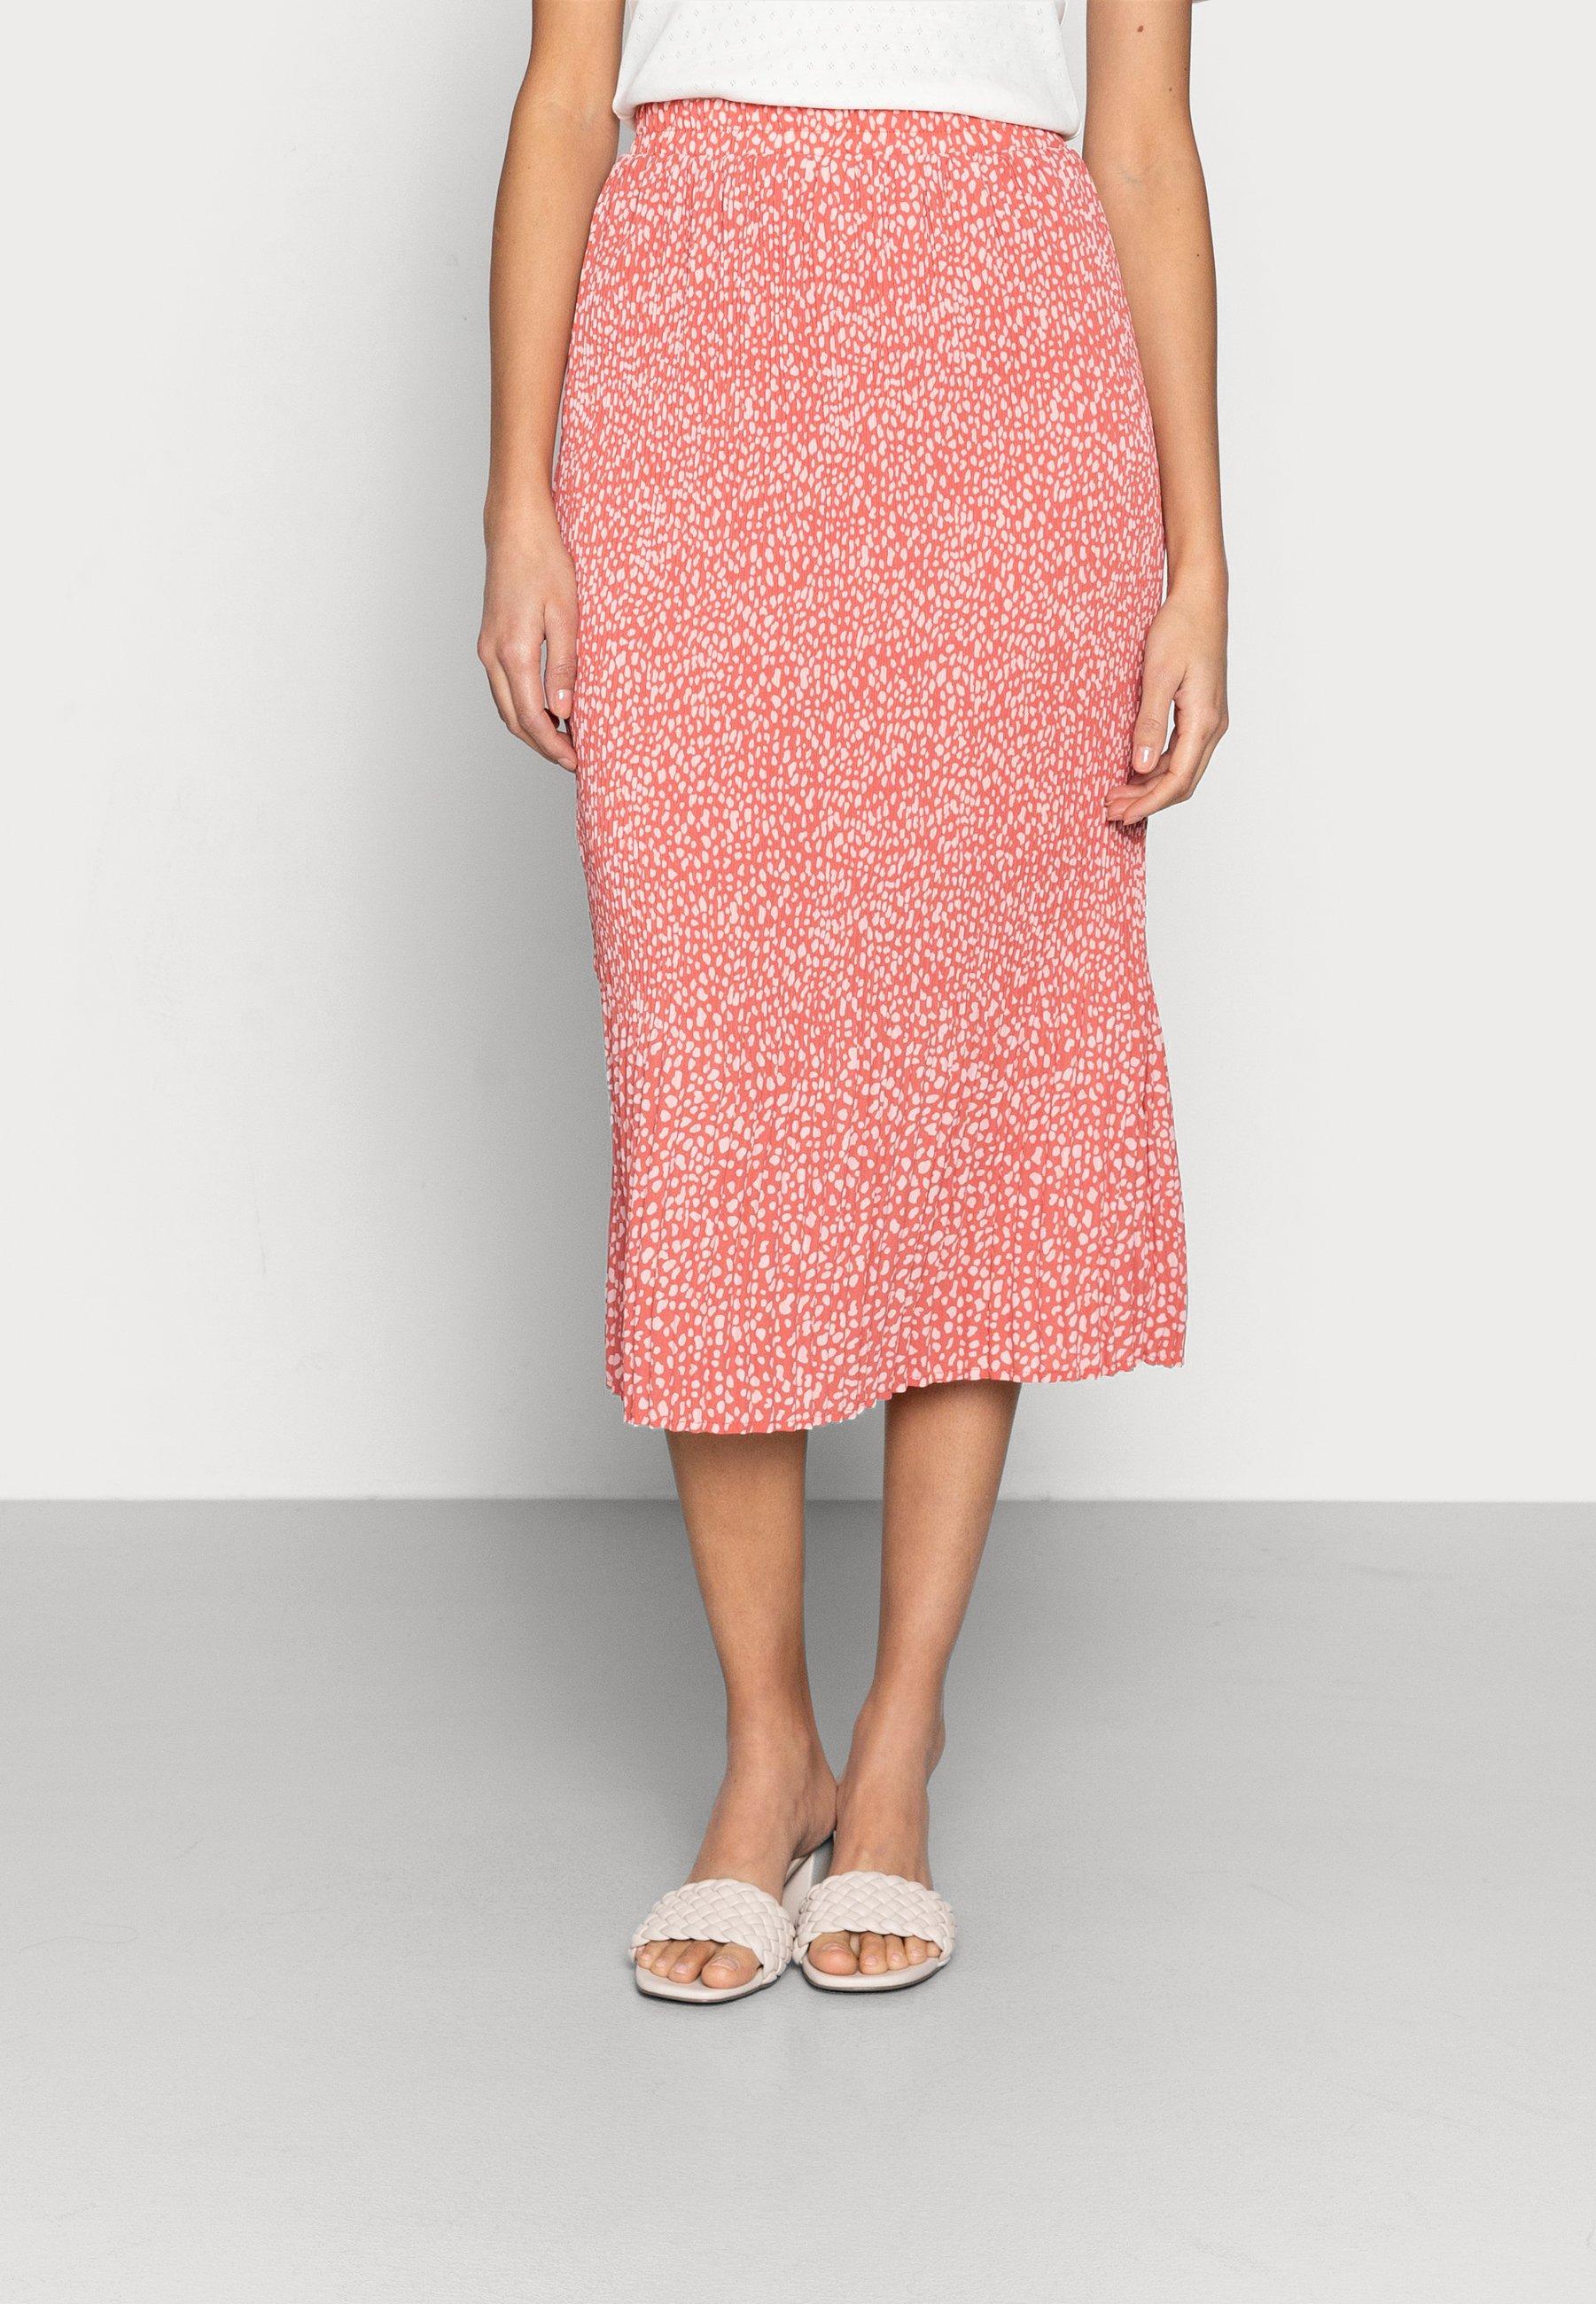 Femme CLOVER SKIRT - Jupe plissée